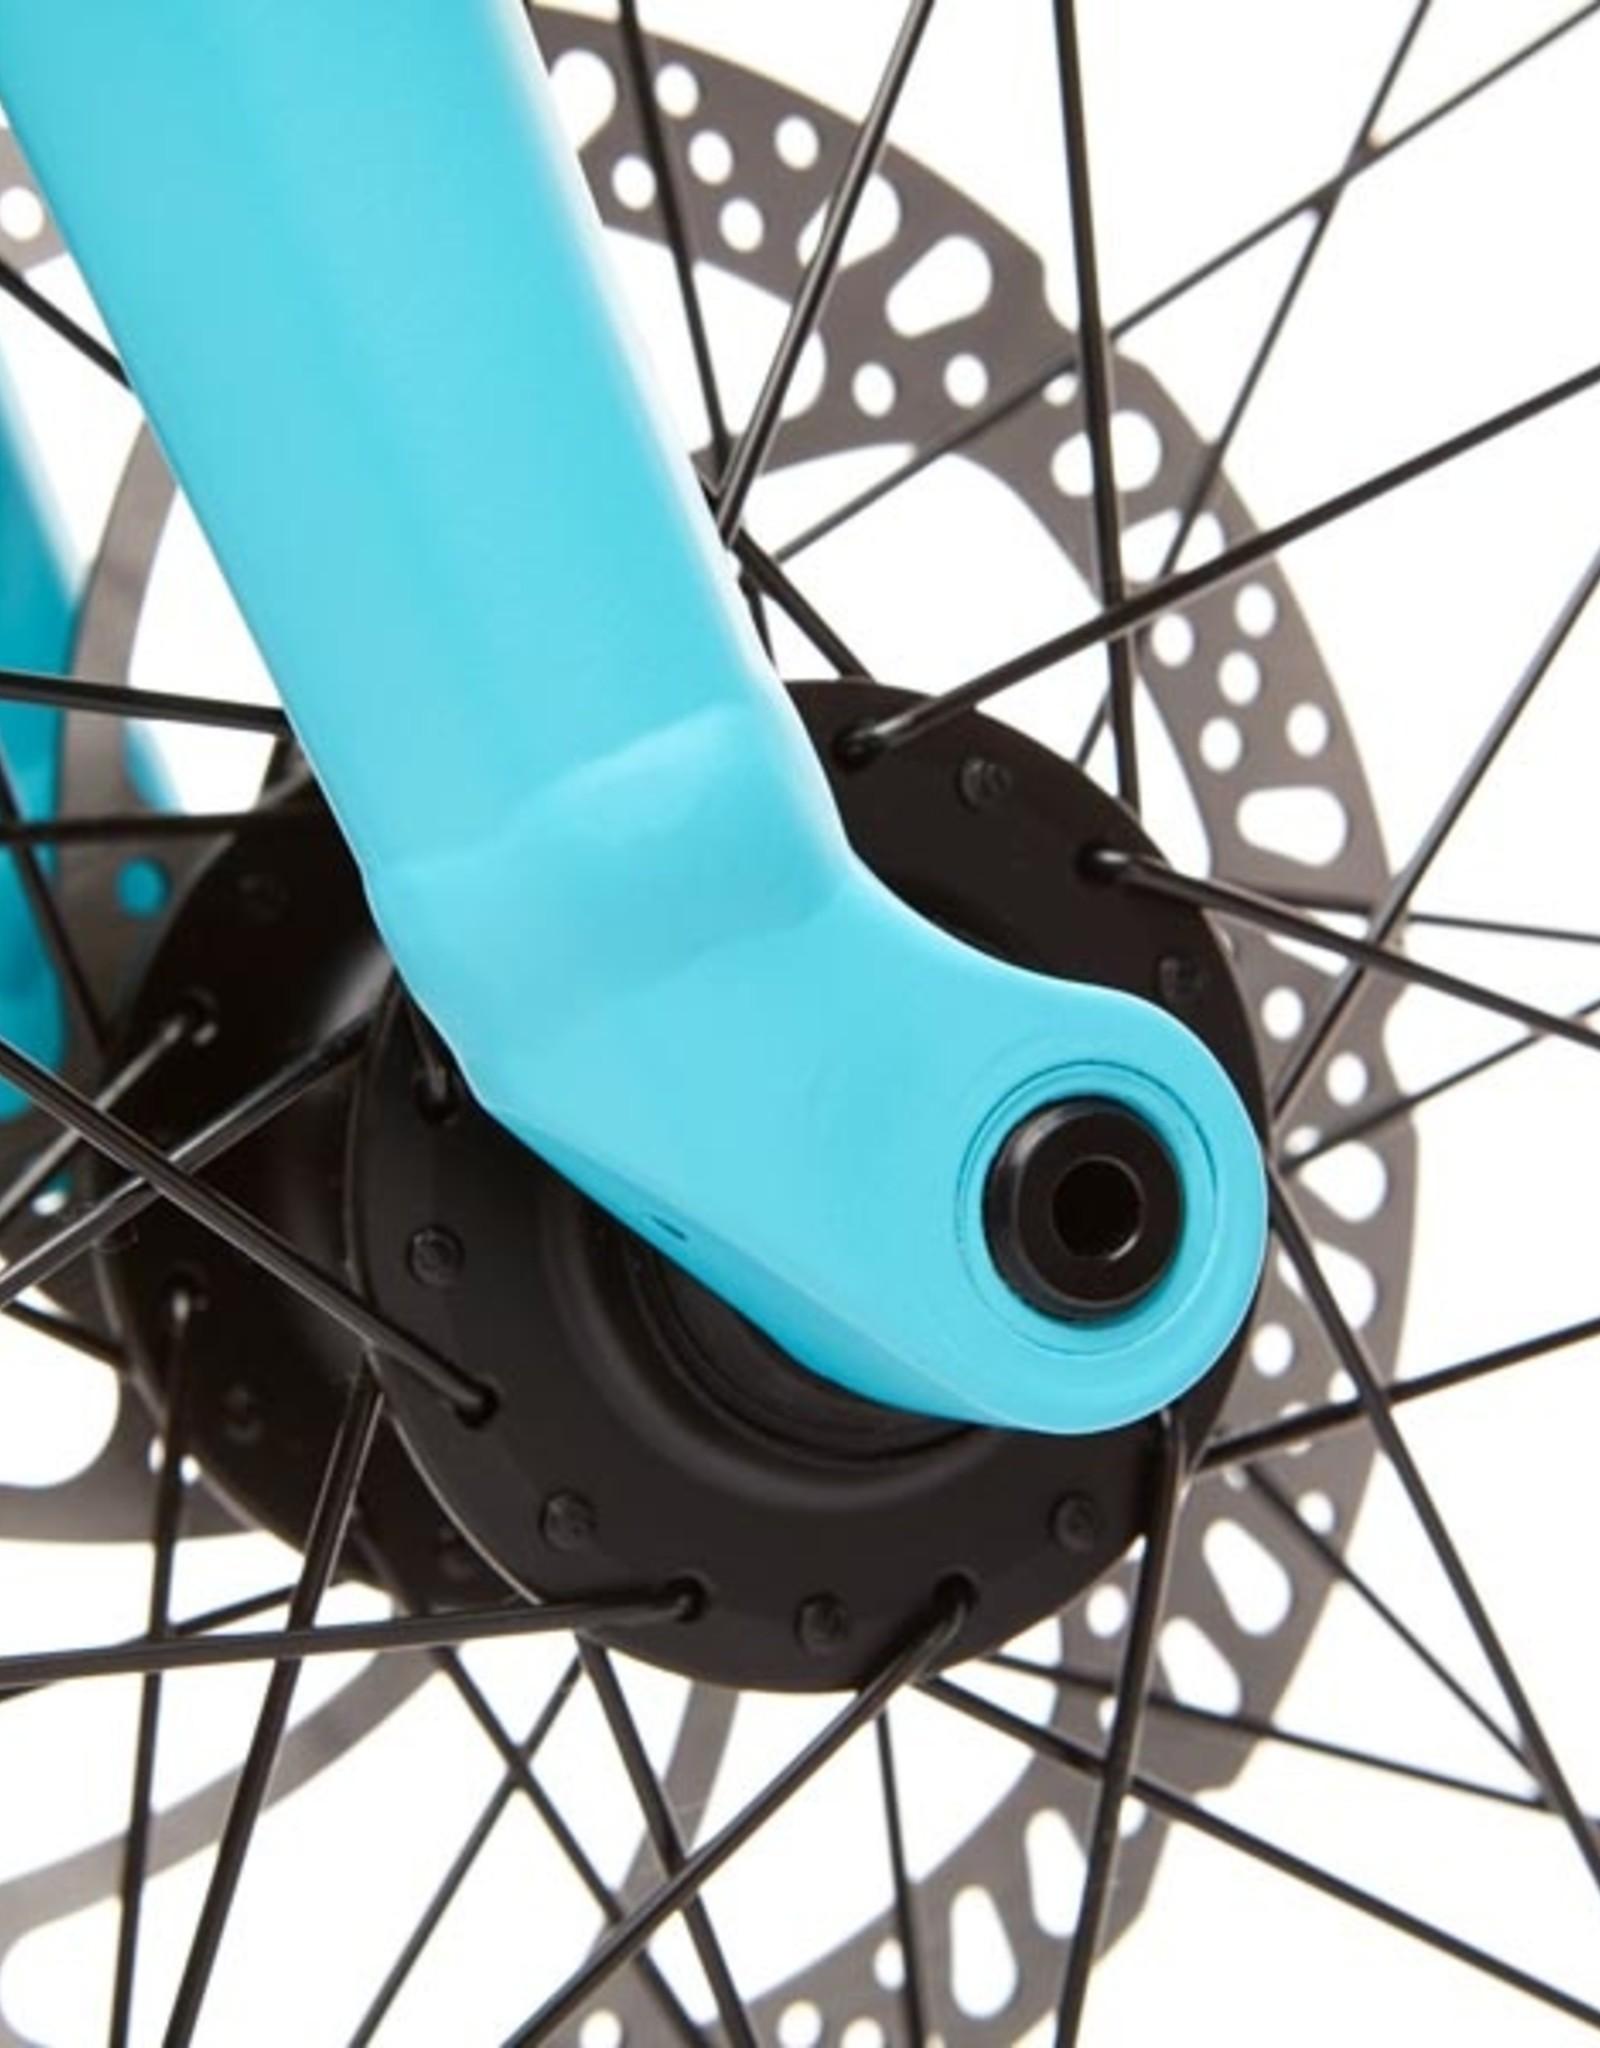 Kona Bicycles Kona Electric Ute (Slime) 2020